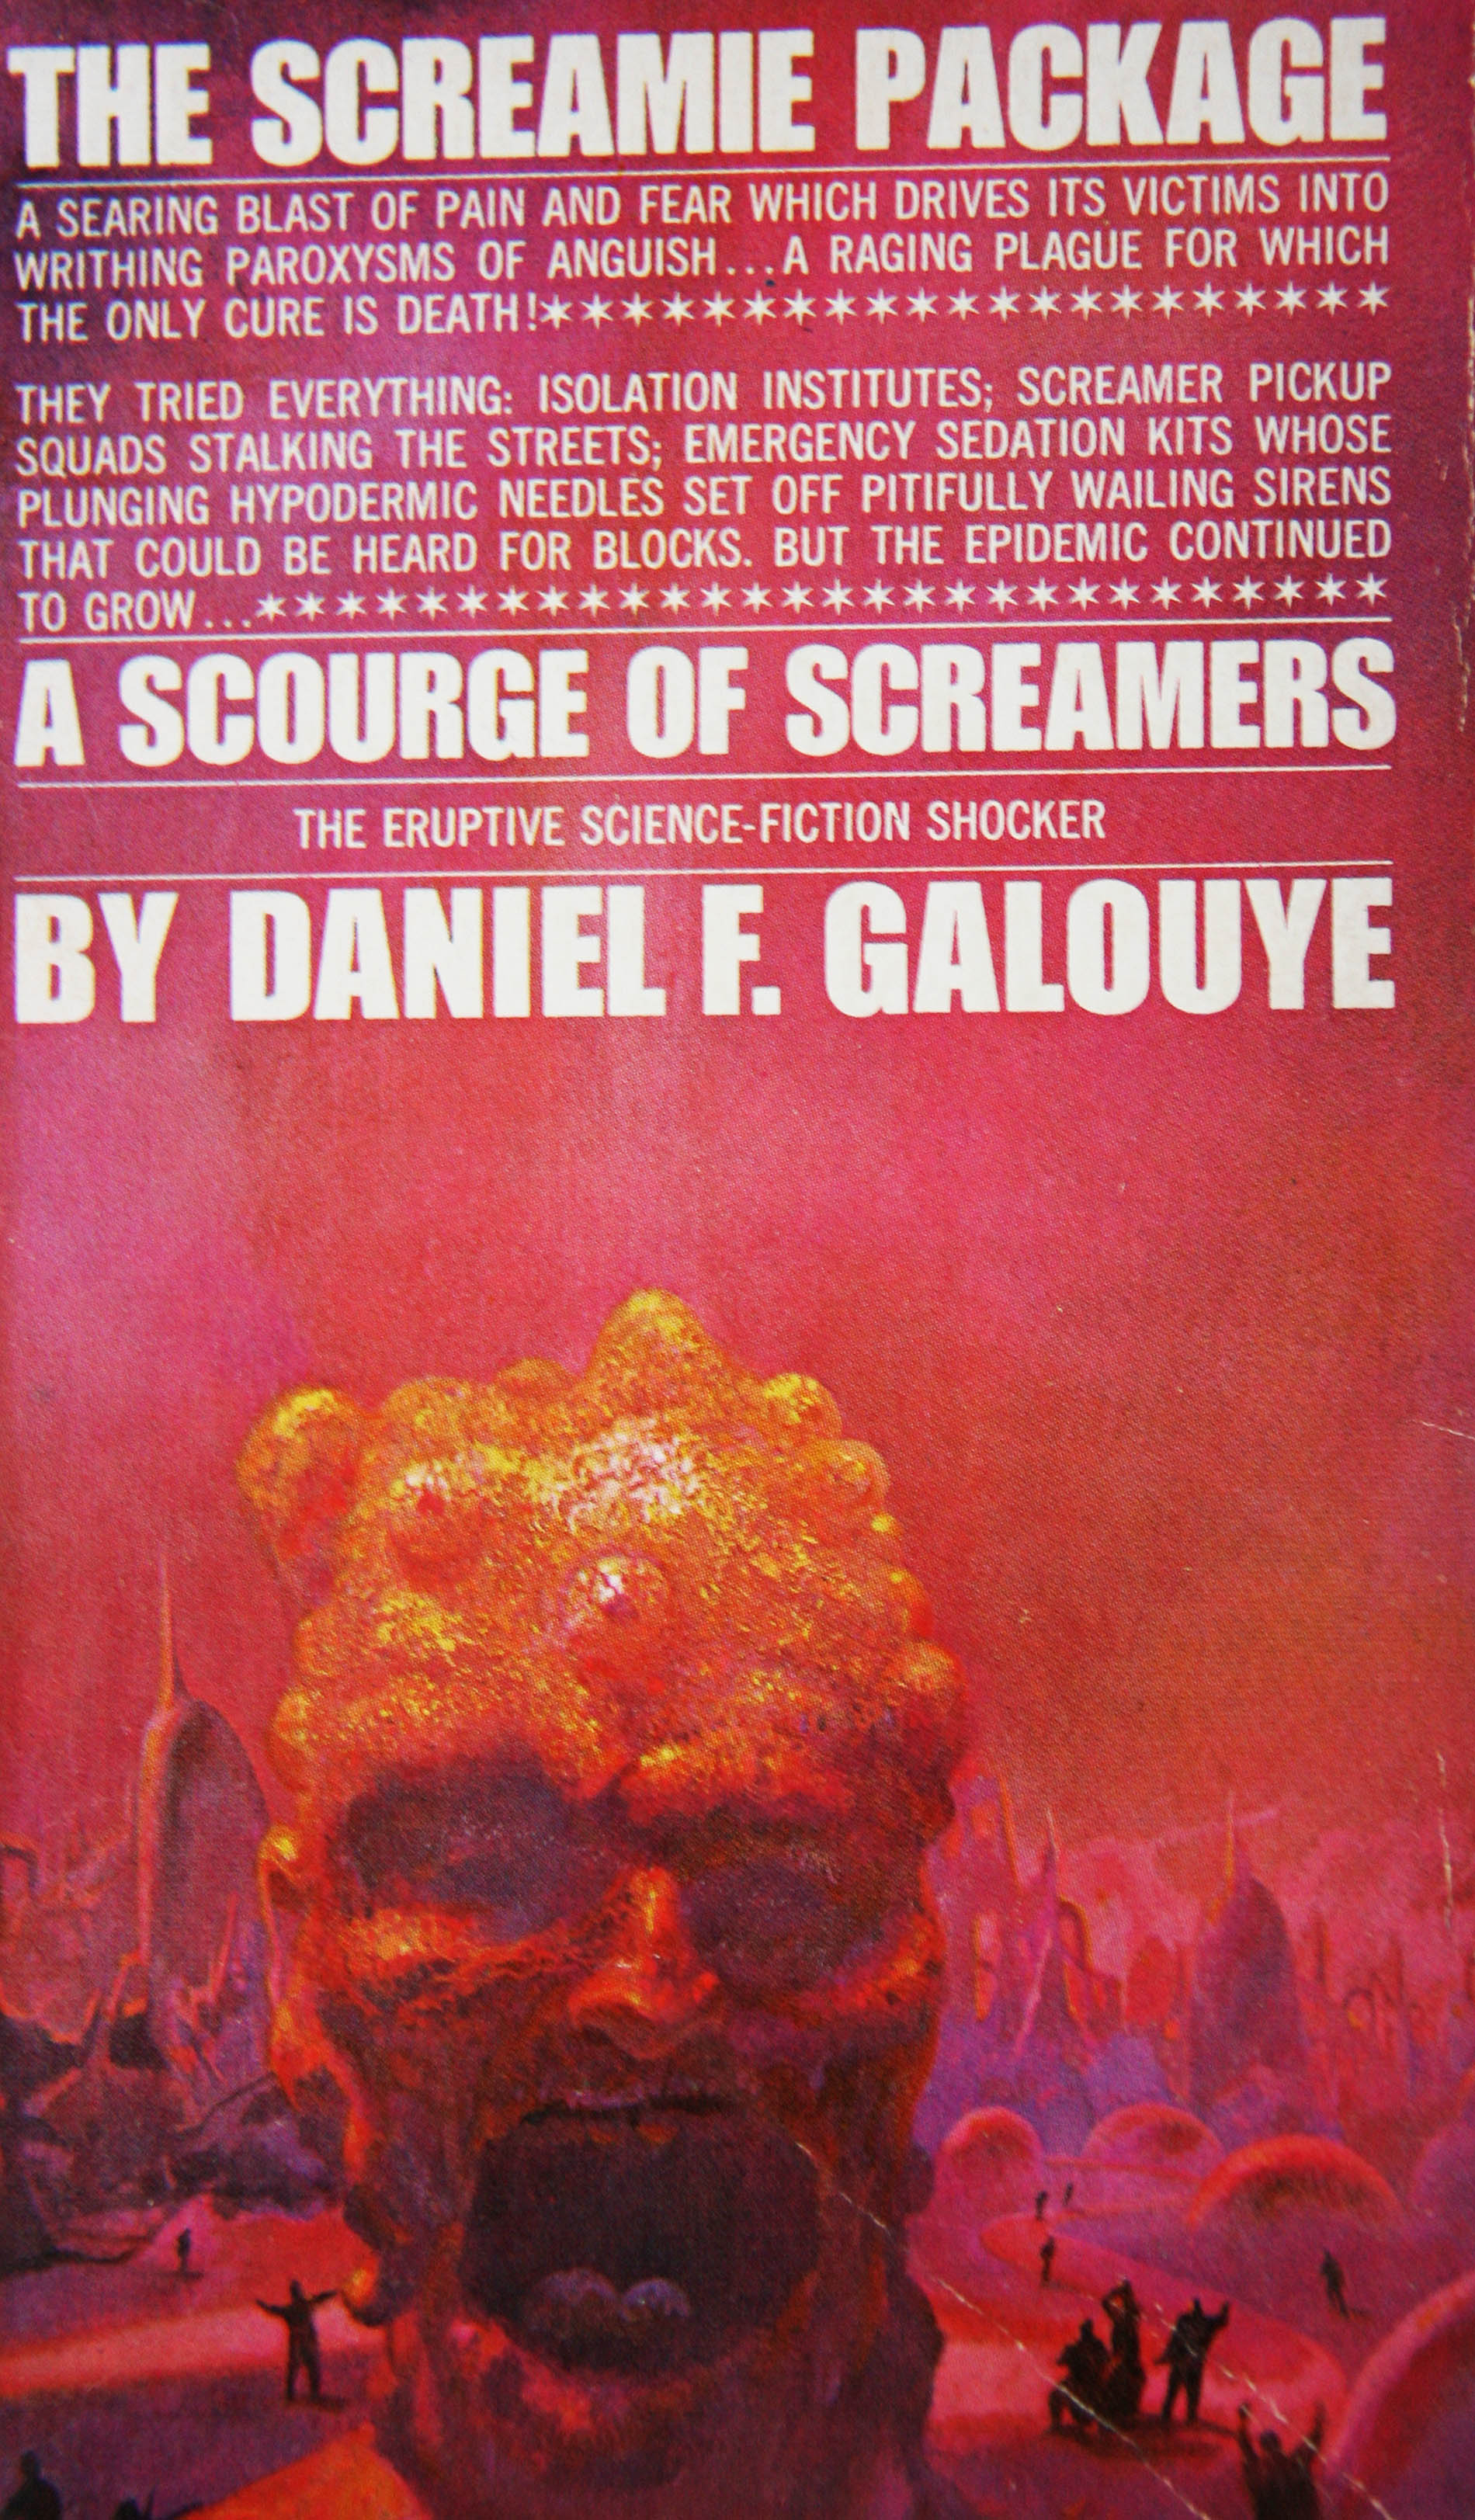 Paperback, Bantam Books 1968